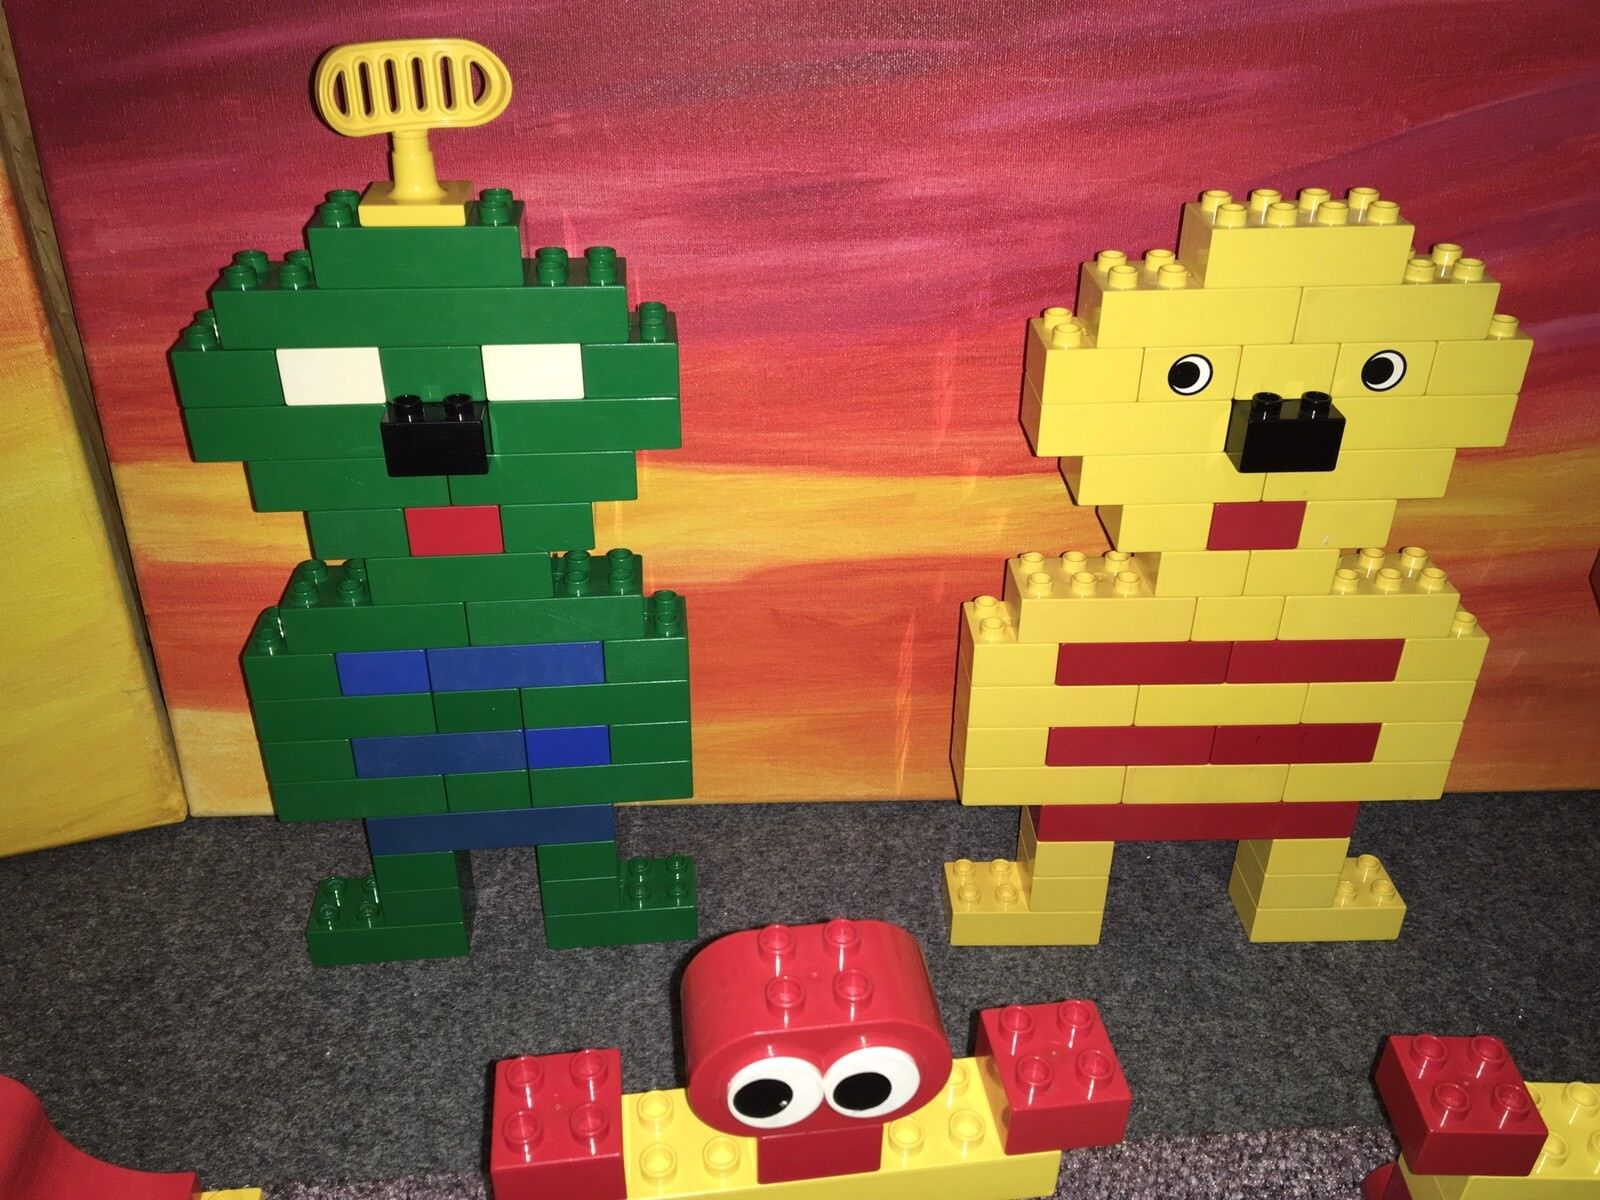 LEGO DUPLO Geschenk Bausteine, lustige Köpfe, Fahrzeuge + Geschenk DUPLO   s. Aufbaubeispiele d36c71